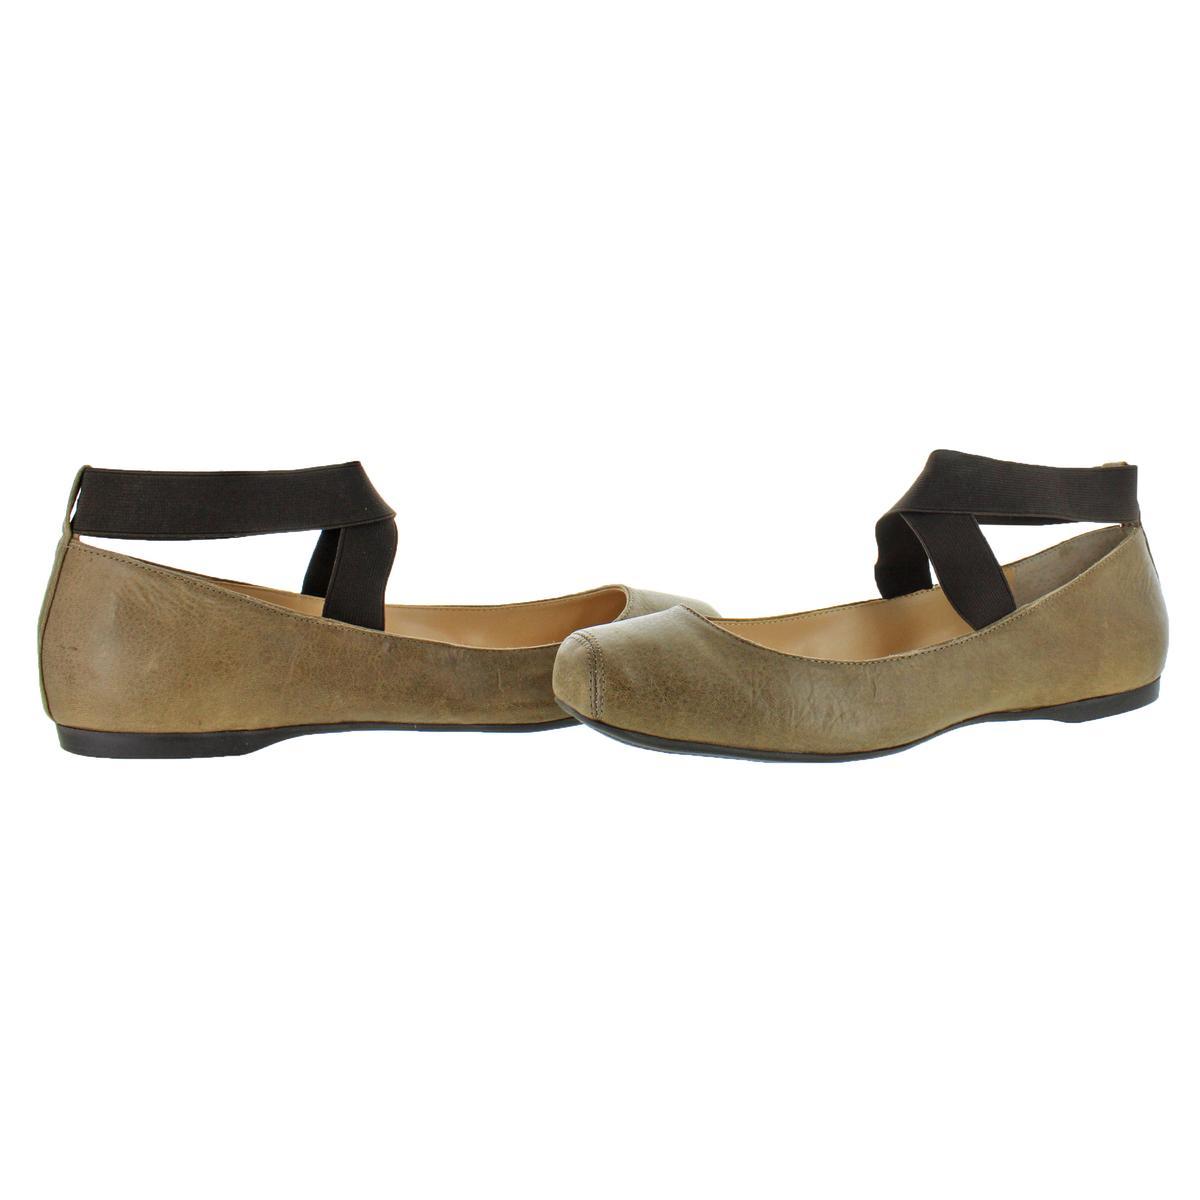 Jessica-Simpson-Women-039-s-Mandalaye-Square-Toe-Ankle-Wrap-Ballet-Flats thumbnail 5